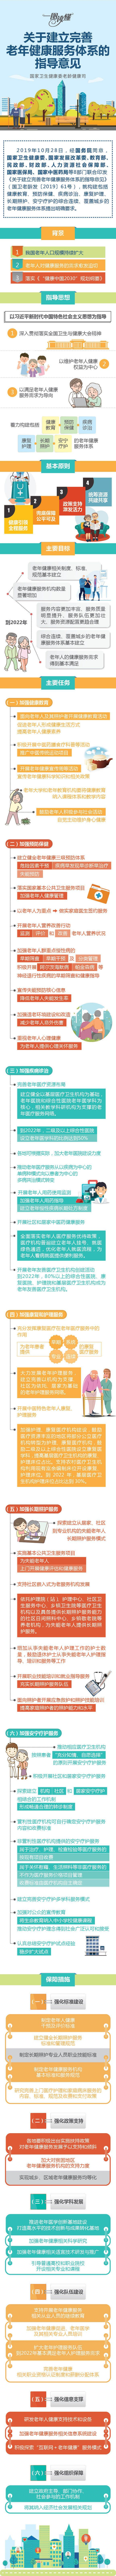 "500w游戏登入 - 2019数博会开幕 长城汽车携多项智能驾驶""黑科技""亮相"